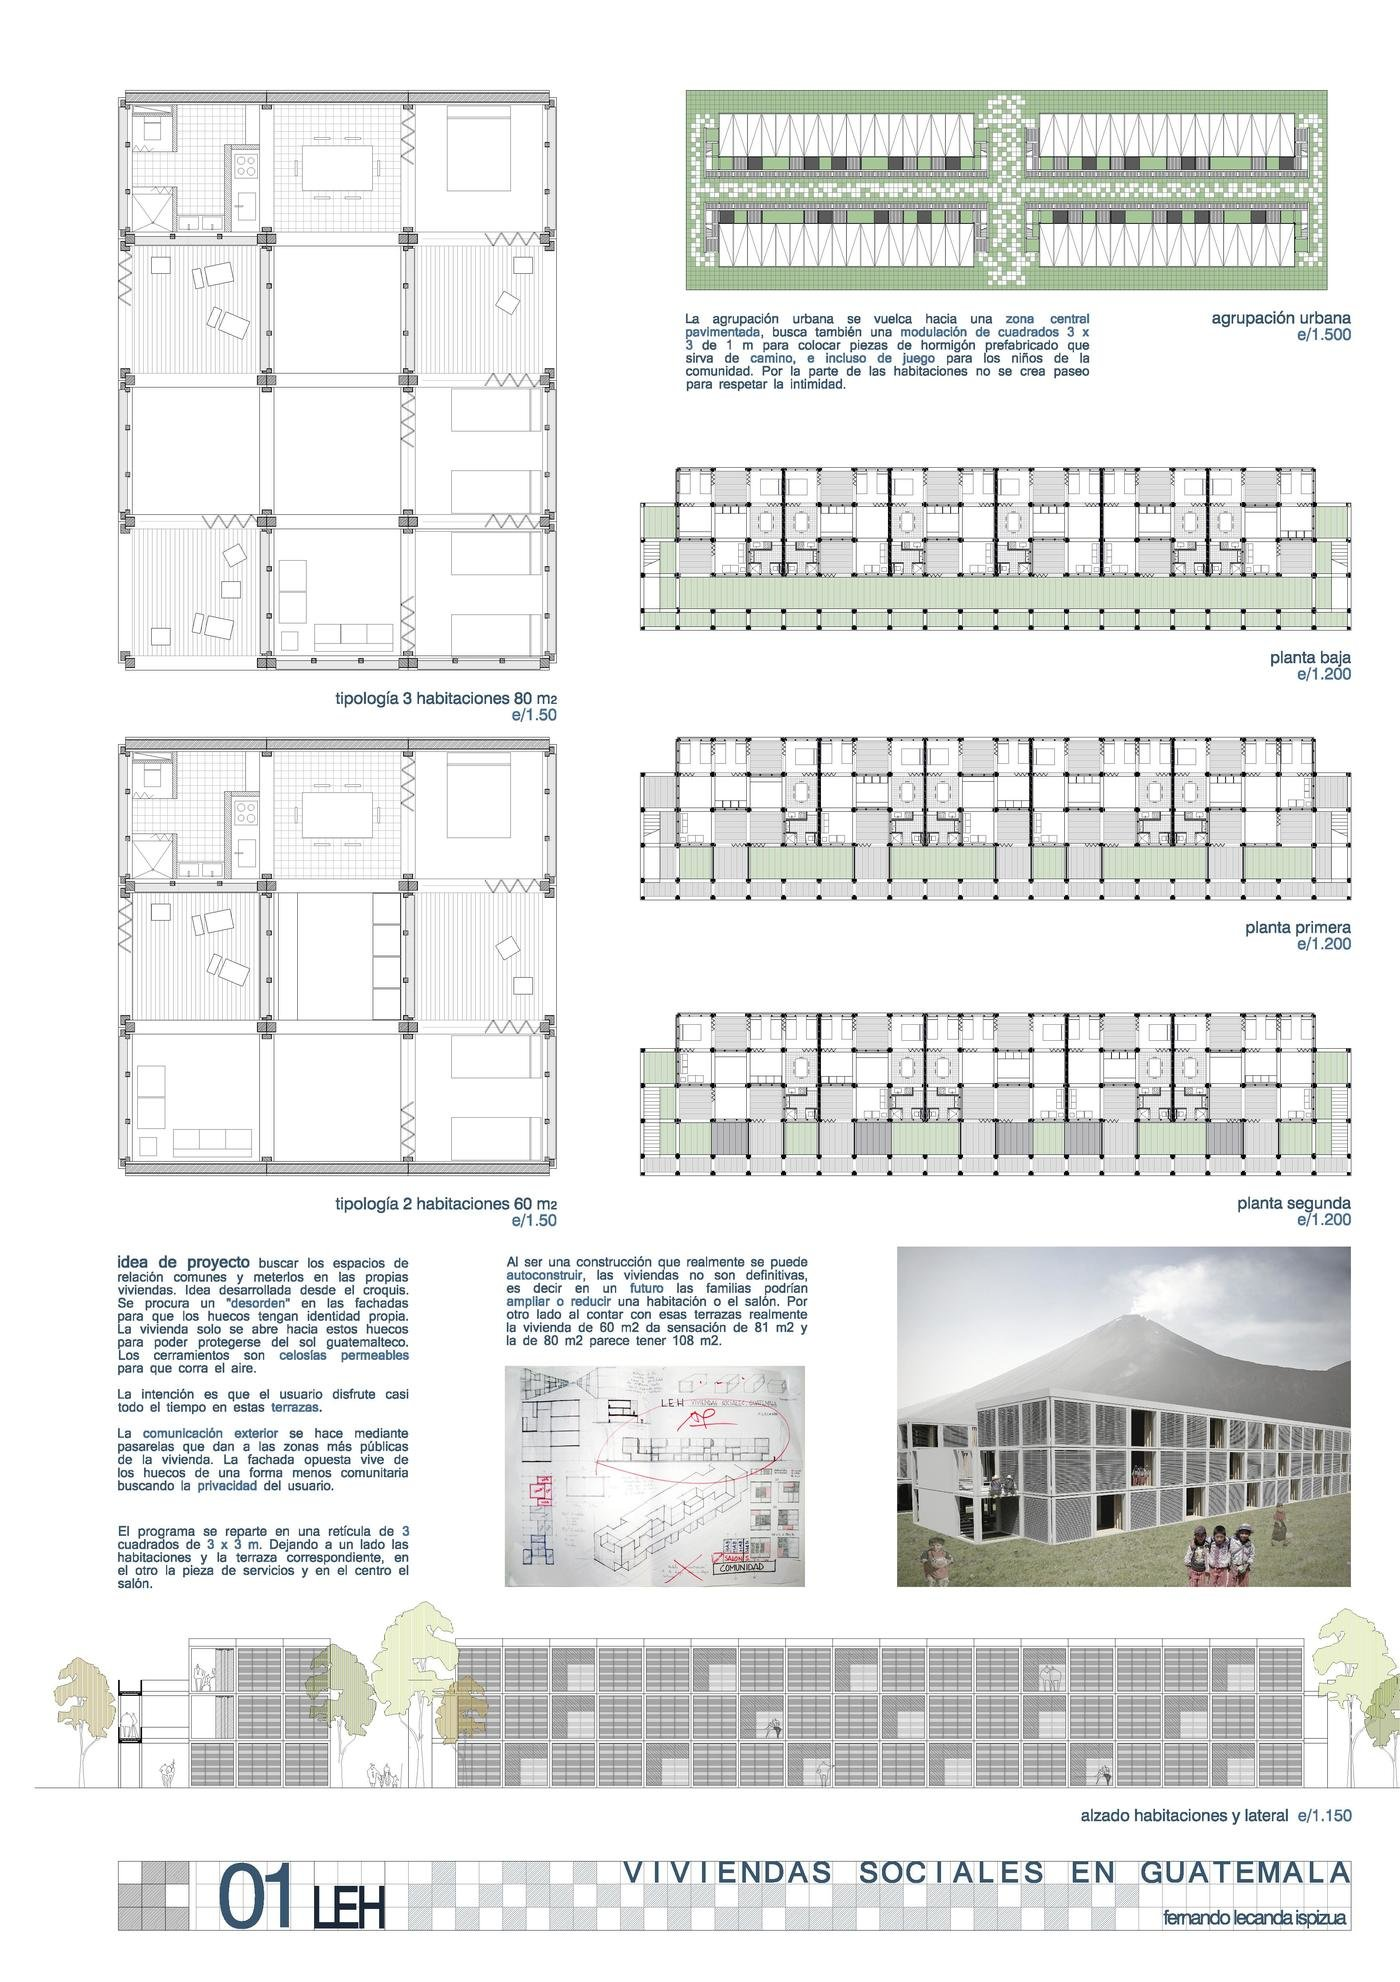 Social Housing Guatemala By Fernando Lecanda At Coroflot Com